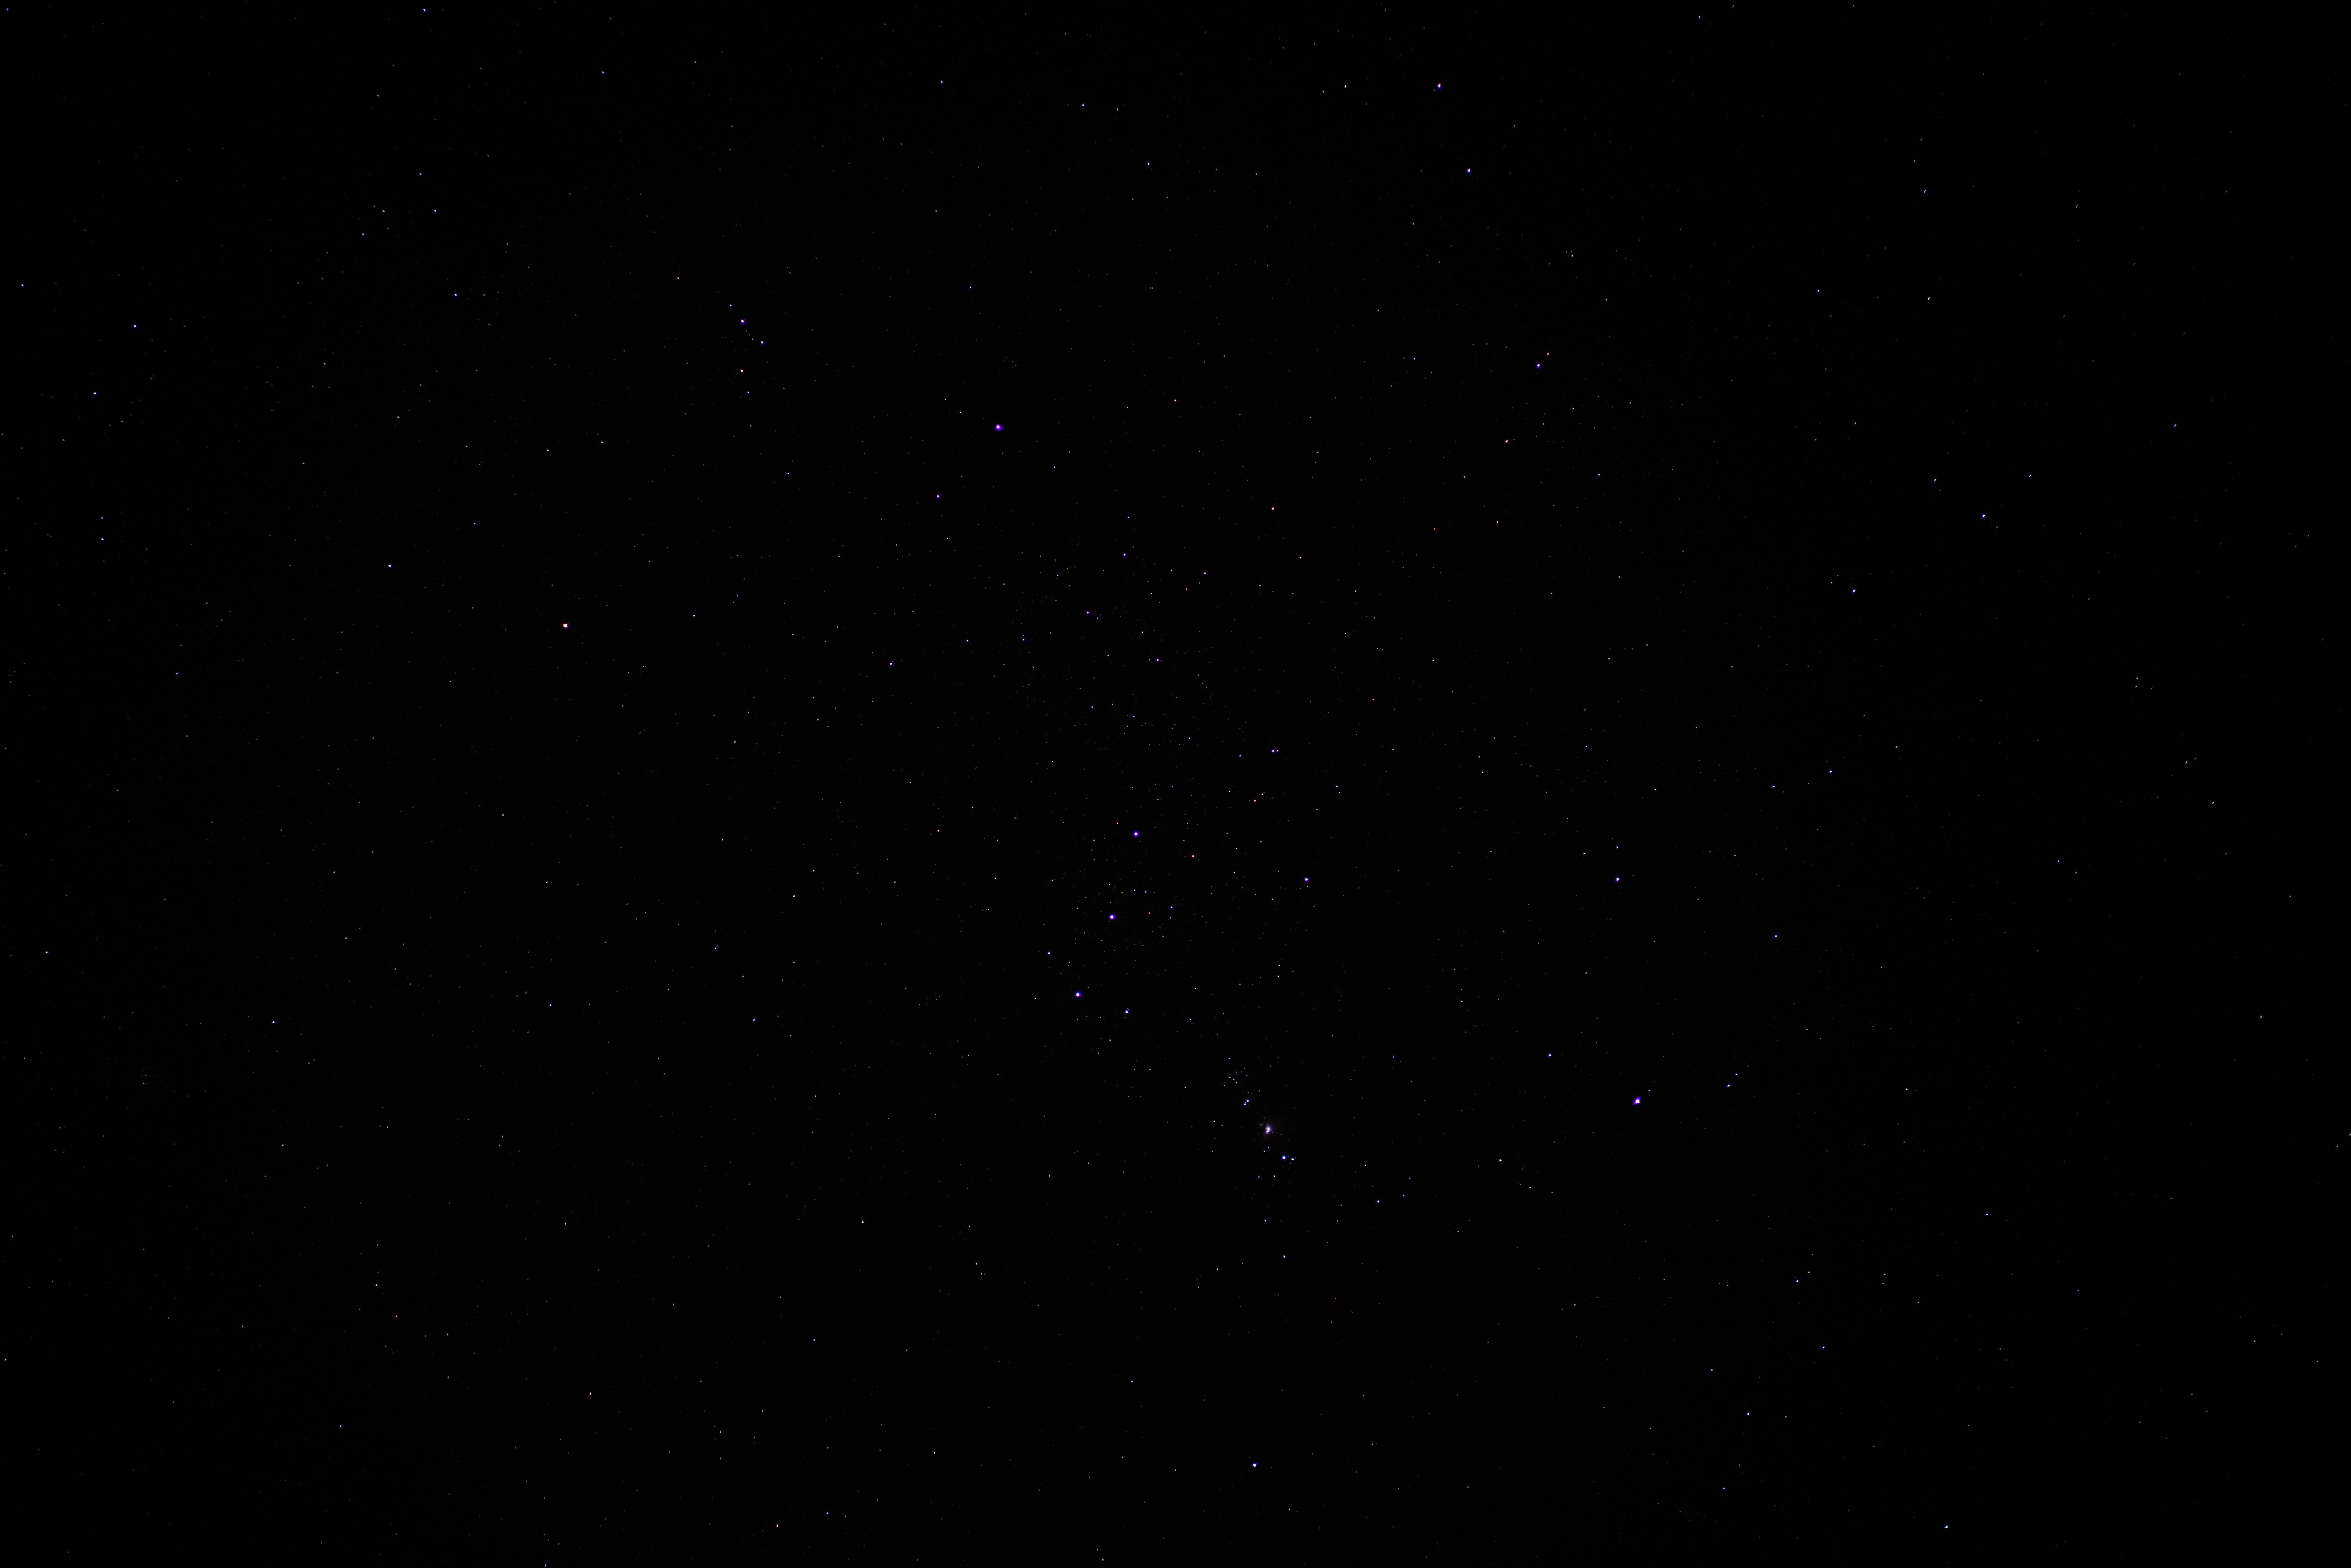 Free Images Milky Way Atmosphere Dark Darkness Night